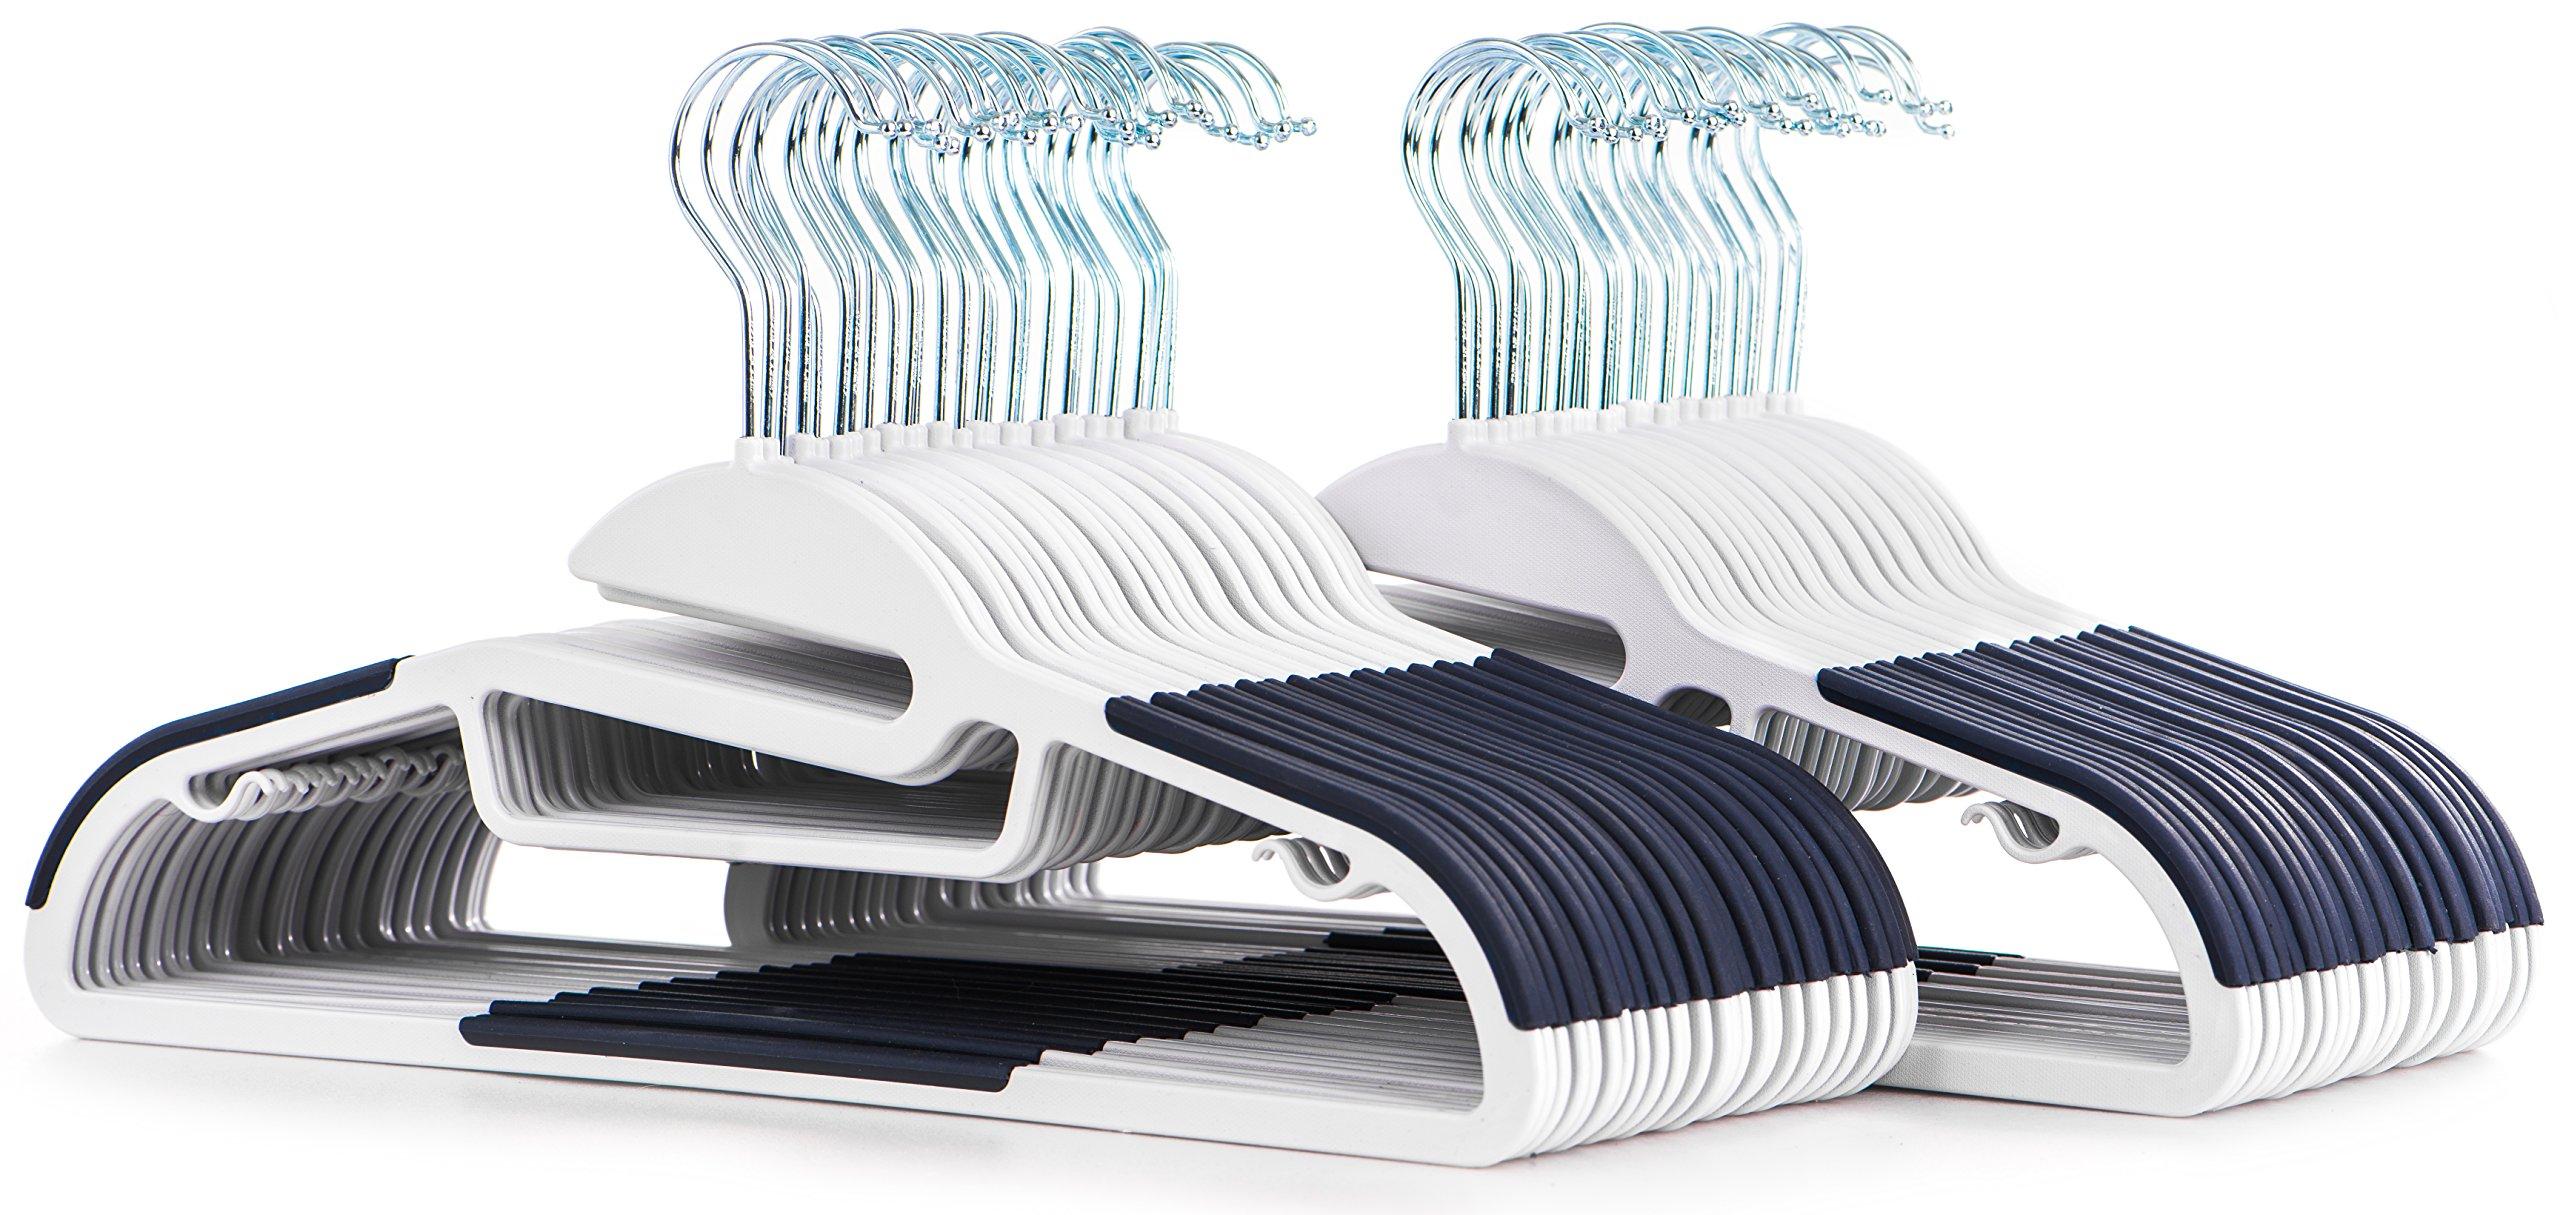 Popular Design 50pc White Easy-On Hangers with Dark Blue Non-Slip Pads - Premium Quality Clothes Hanger Set